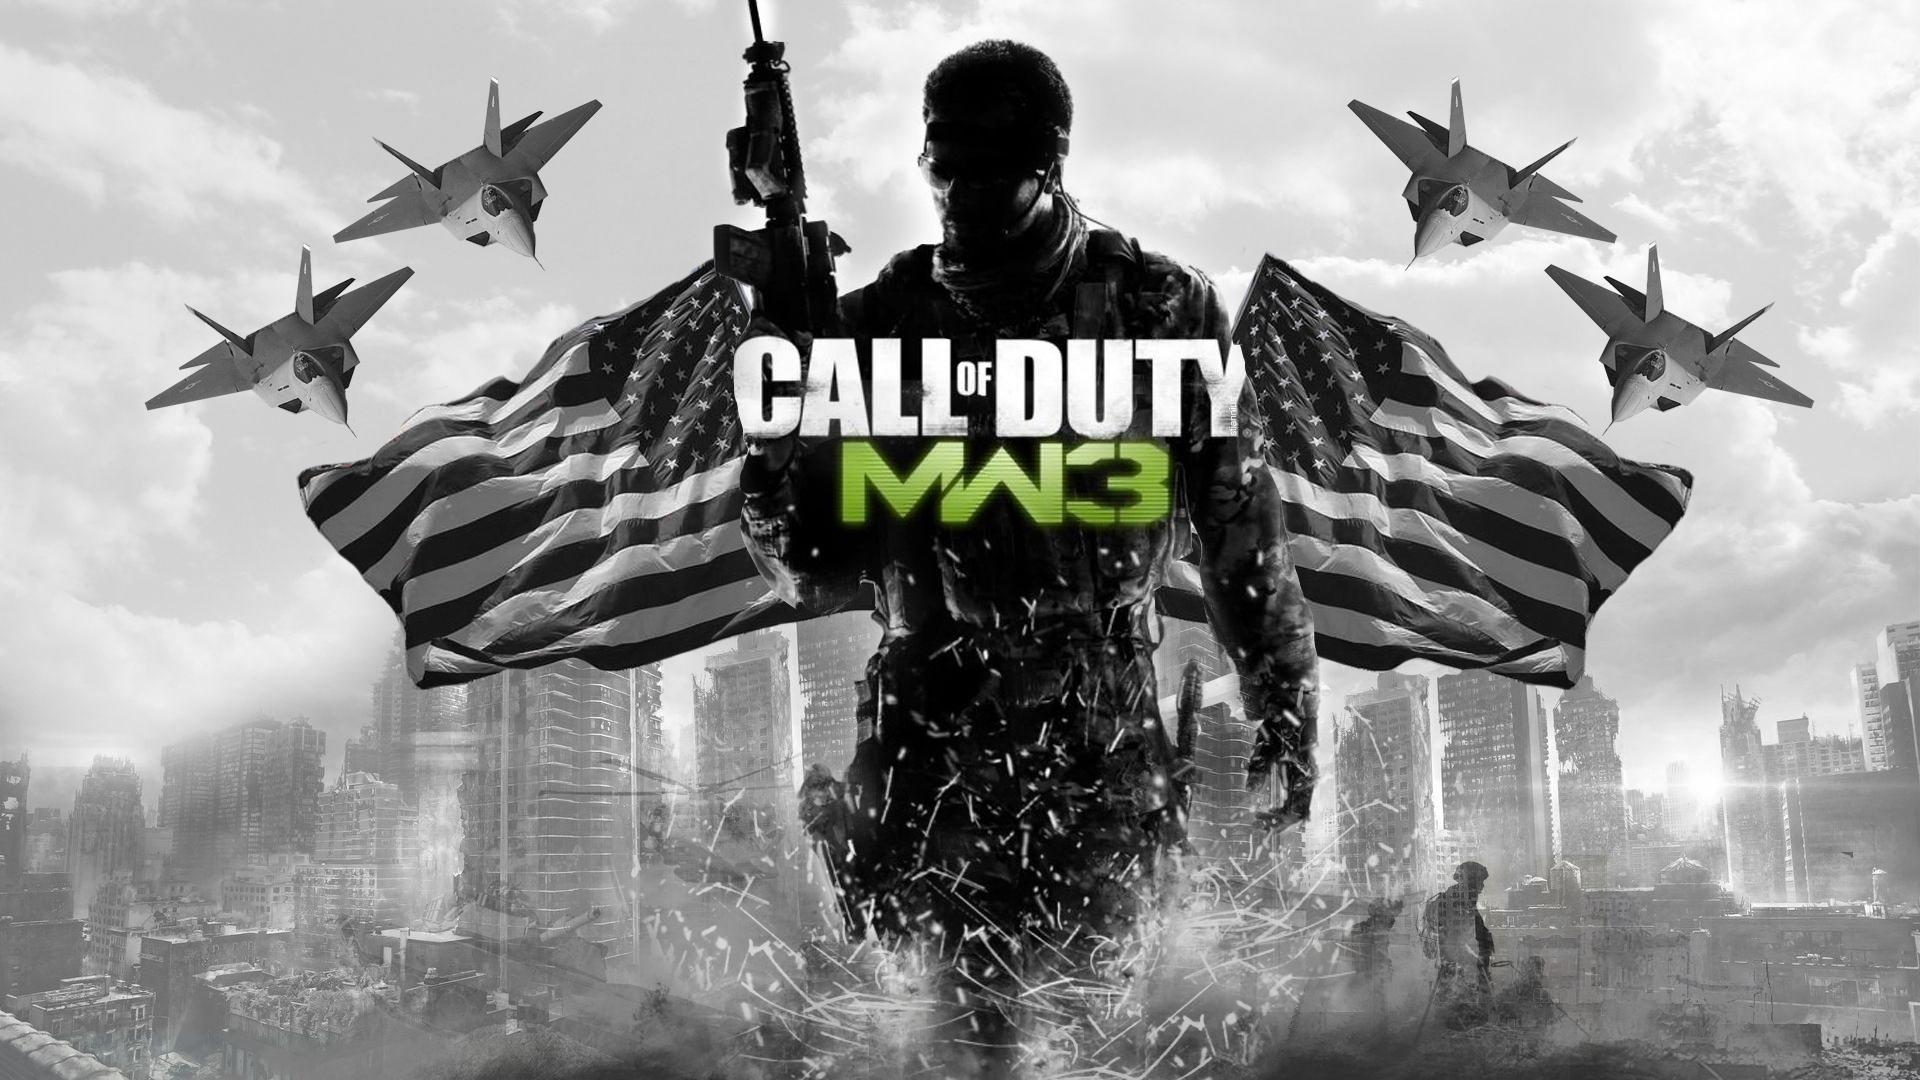 get free call of duty modern warfare 3 cheats | call of duty cheats